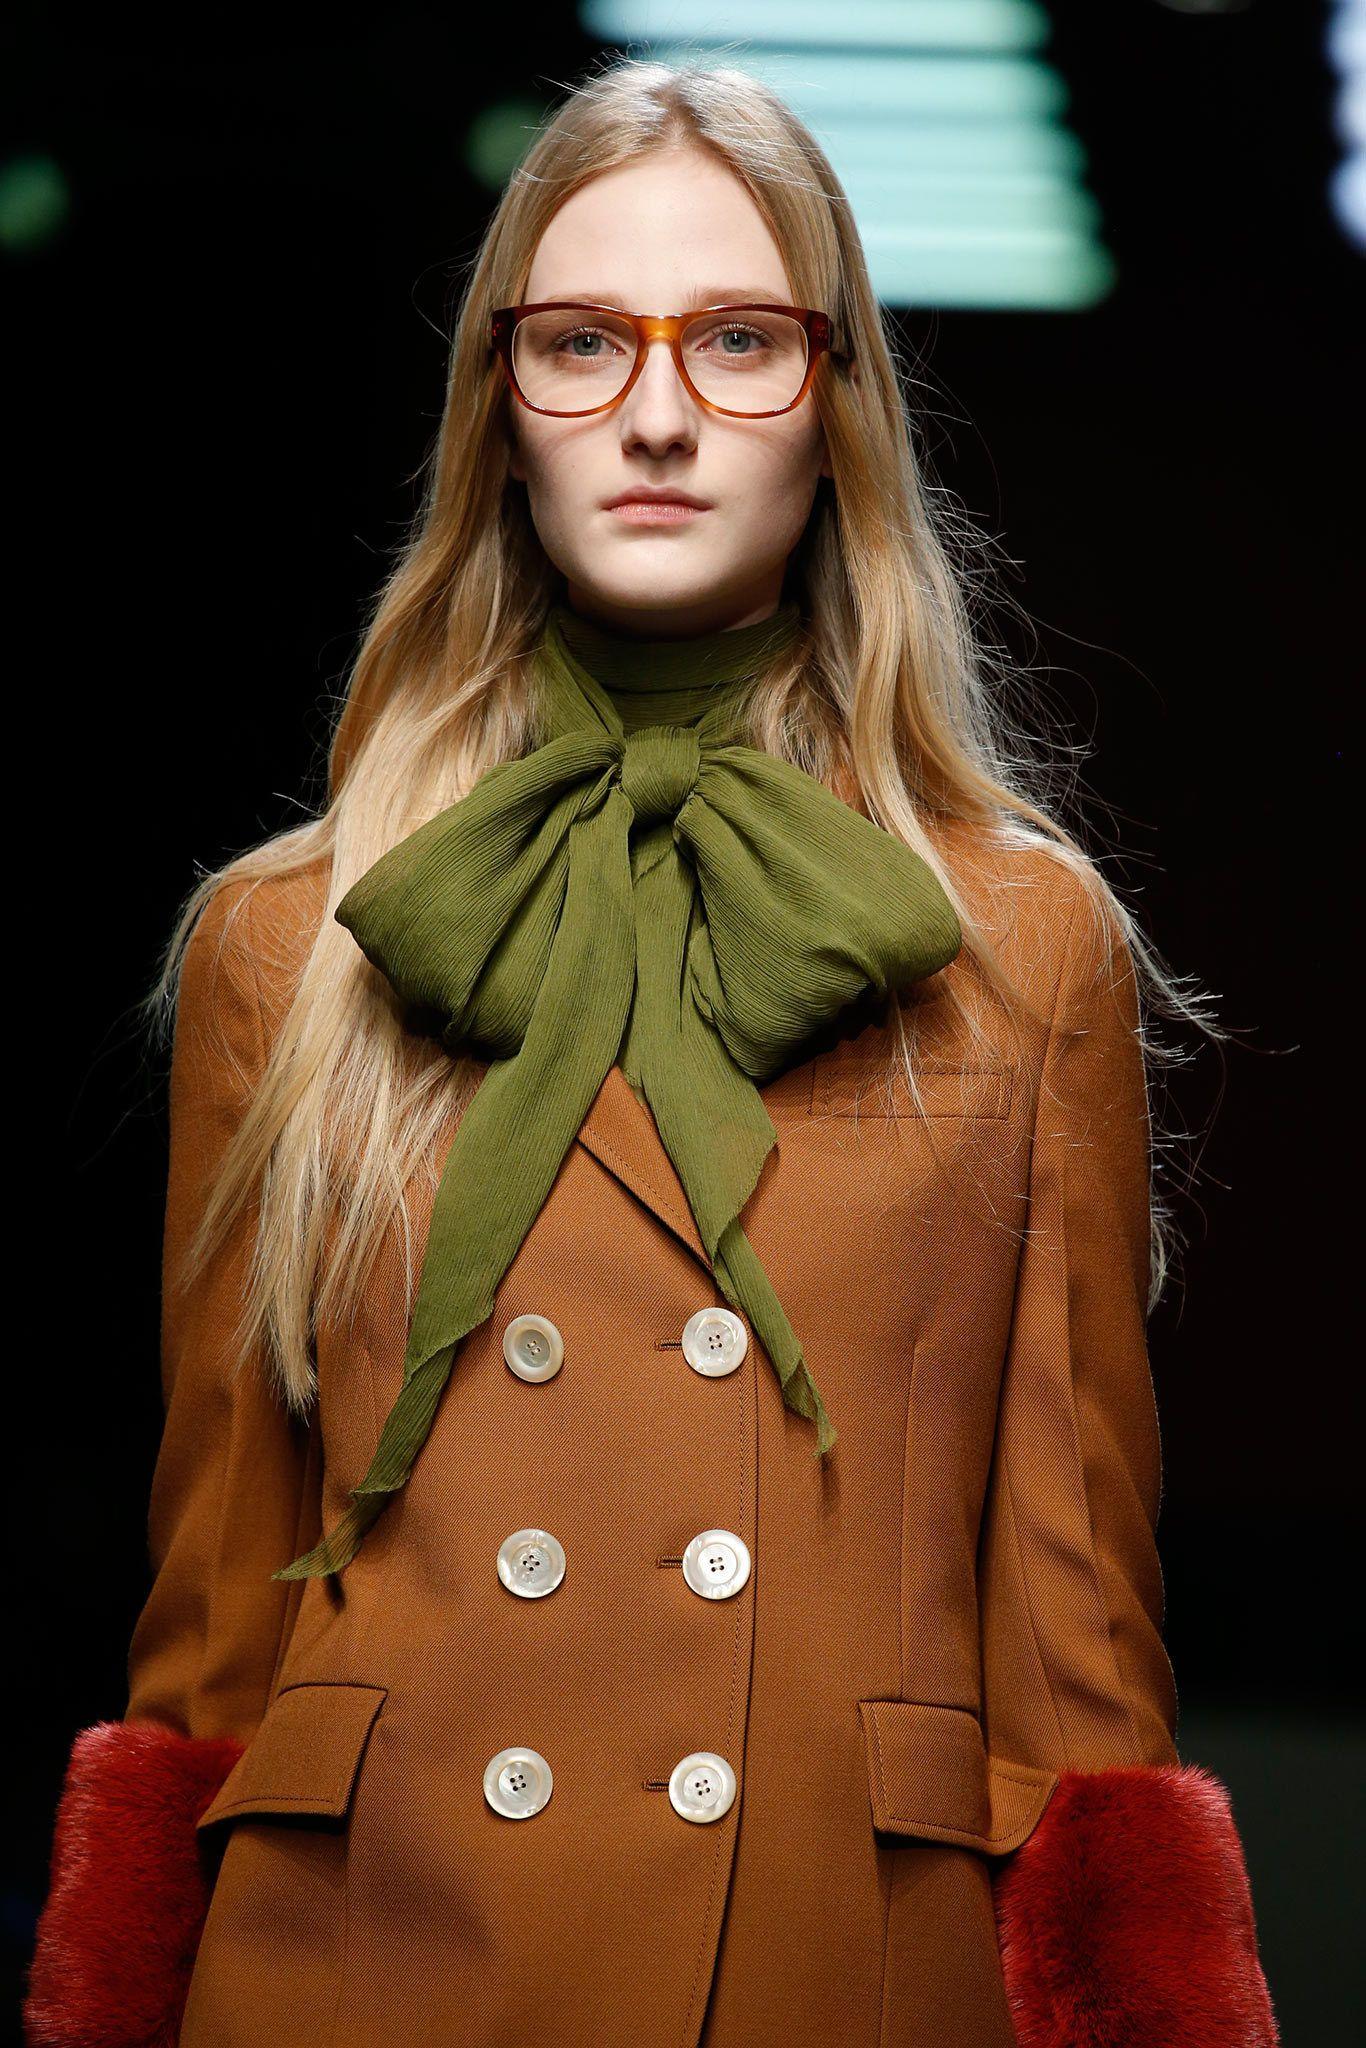 d837c3212f5 Gucci Fall 2015 Ready-to-Wear Fashion Show in 2019 | Gucci | Fashion ...